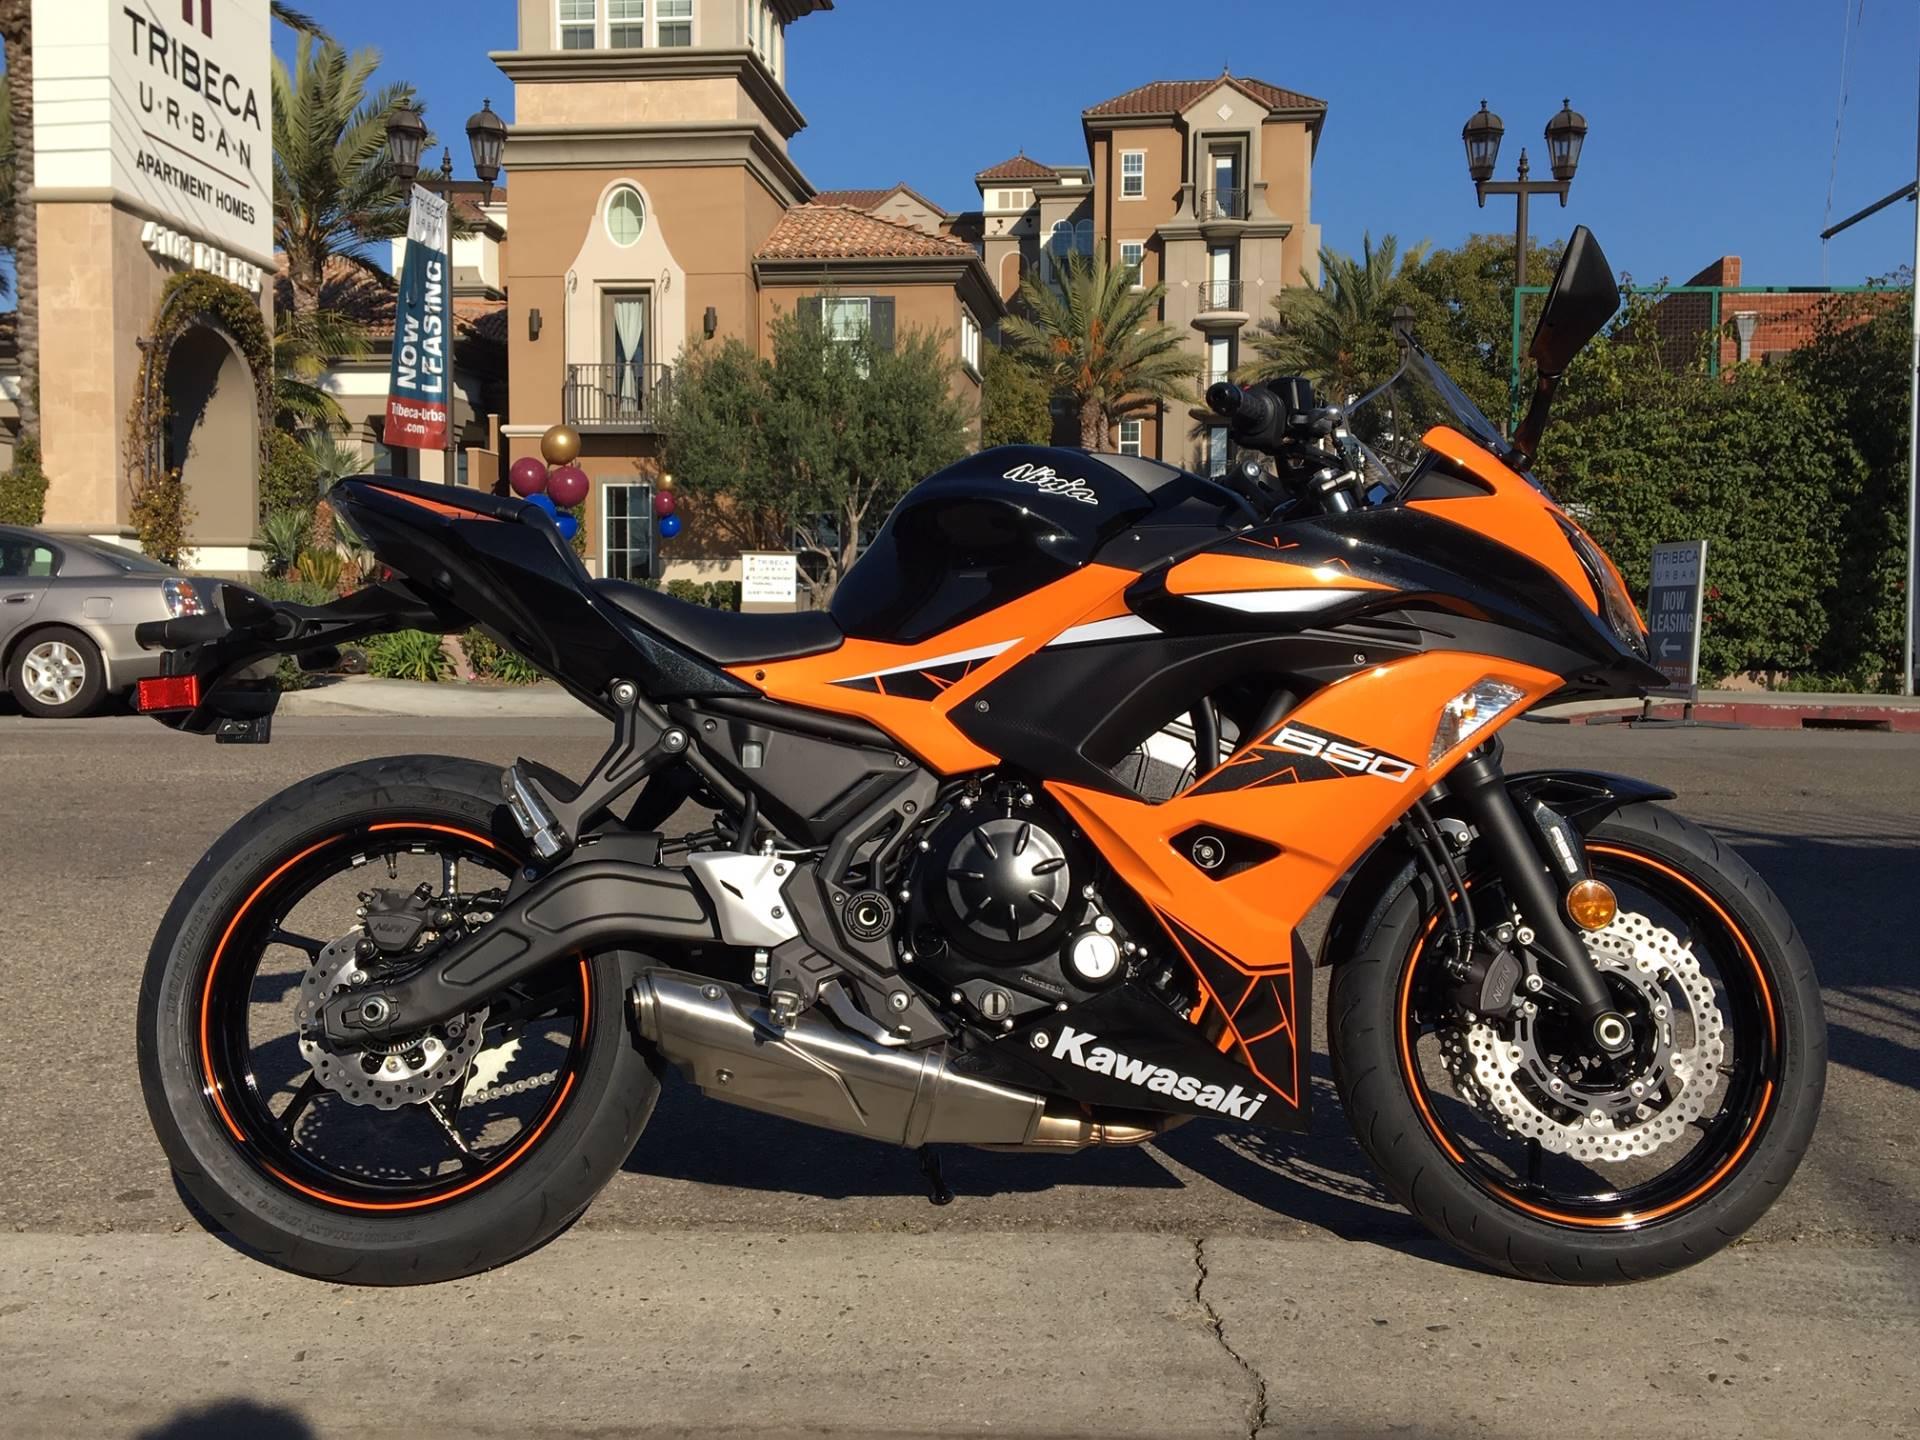 2019 Kawasaki Ninja 650 Abs Motorcycles Marina Del Rey California